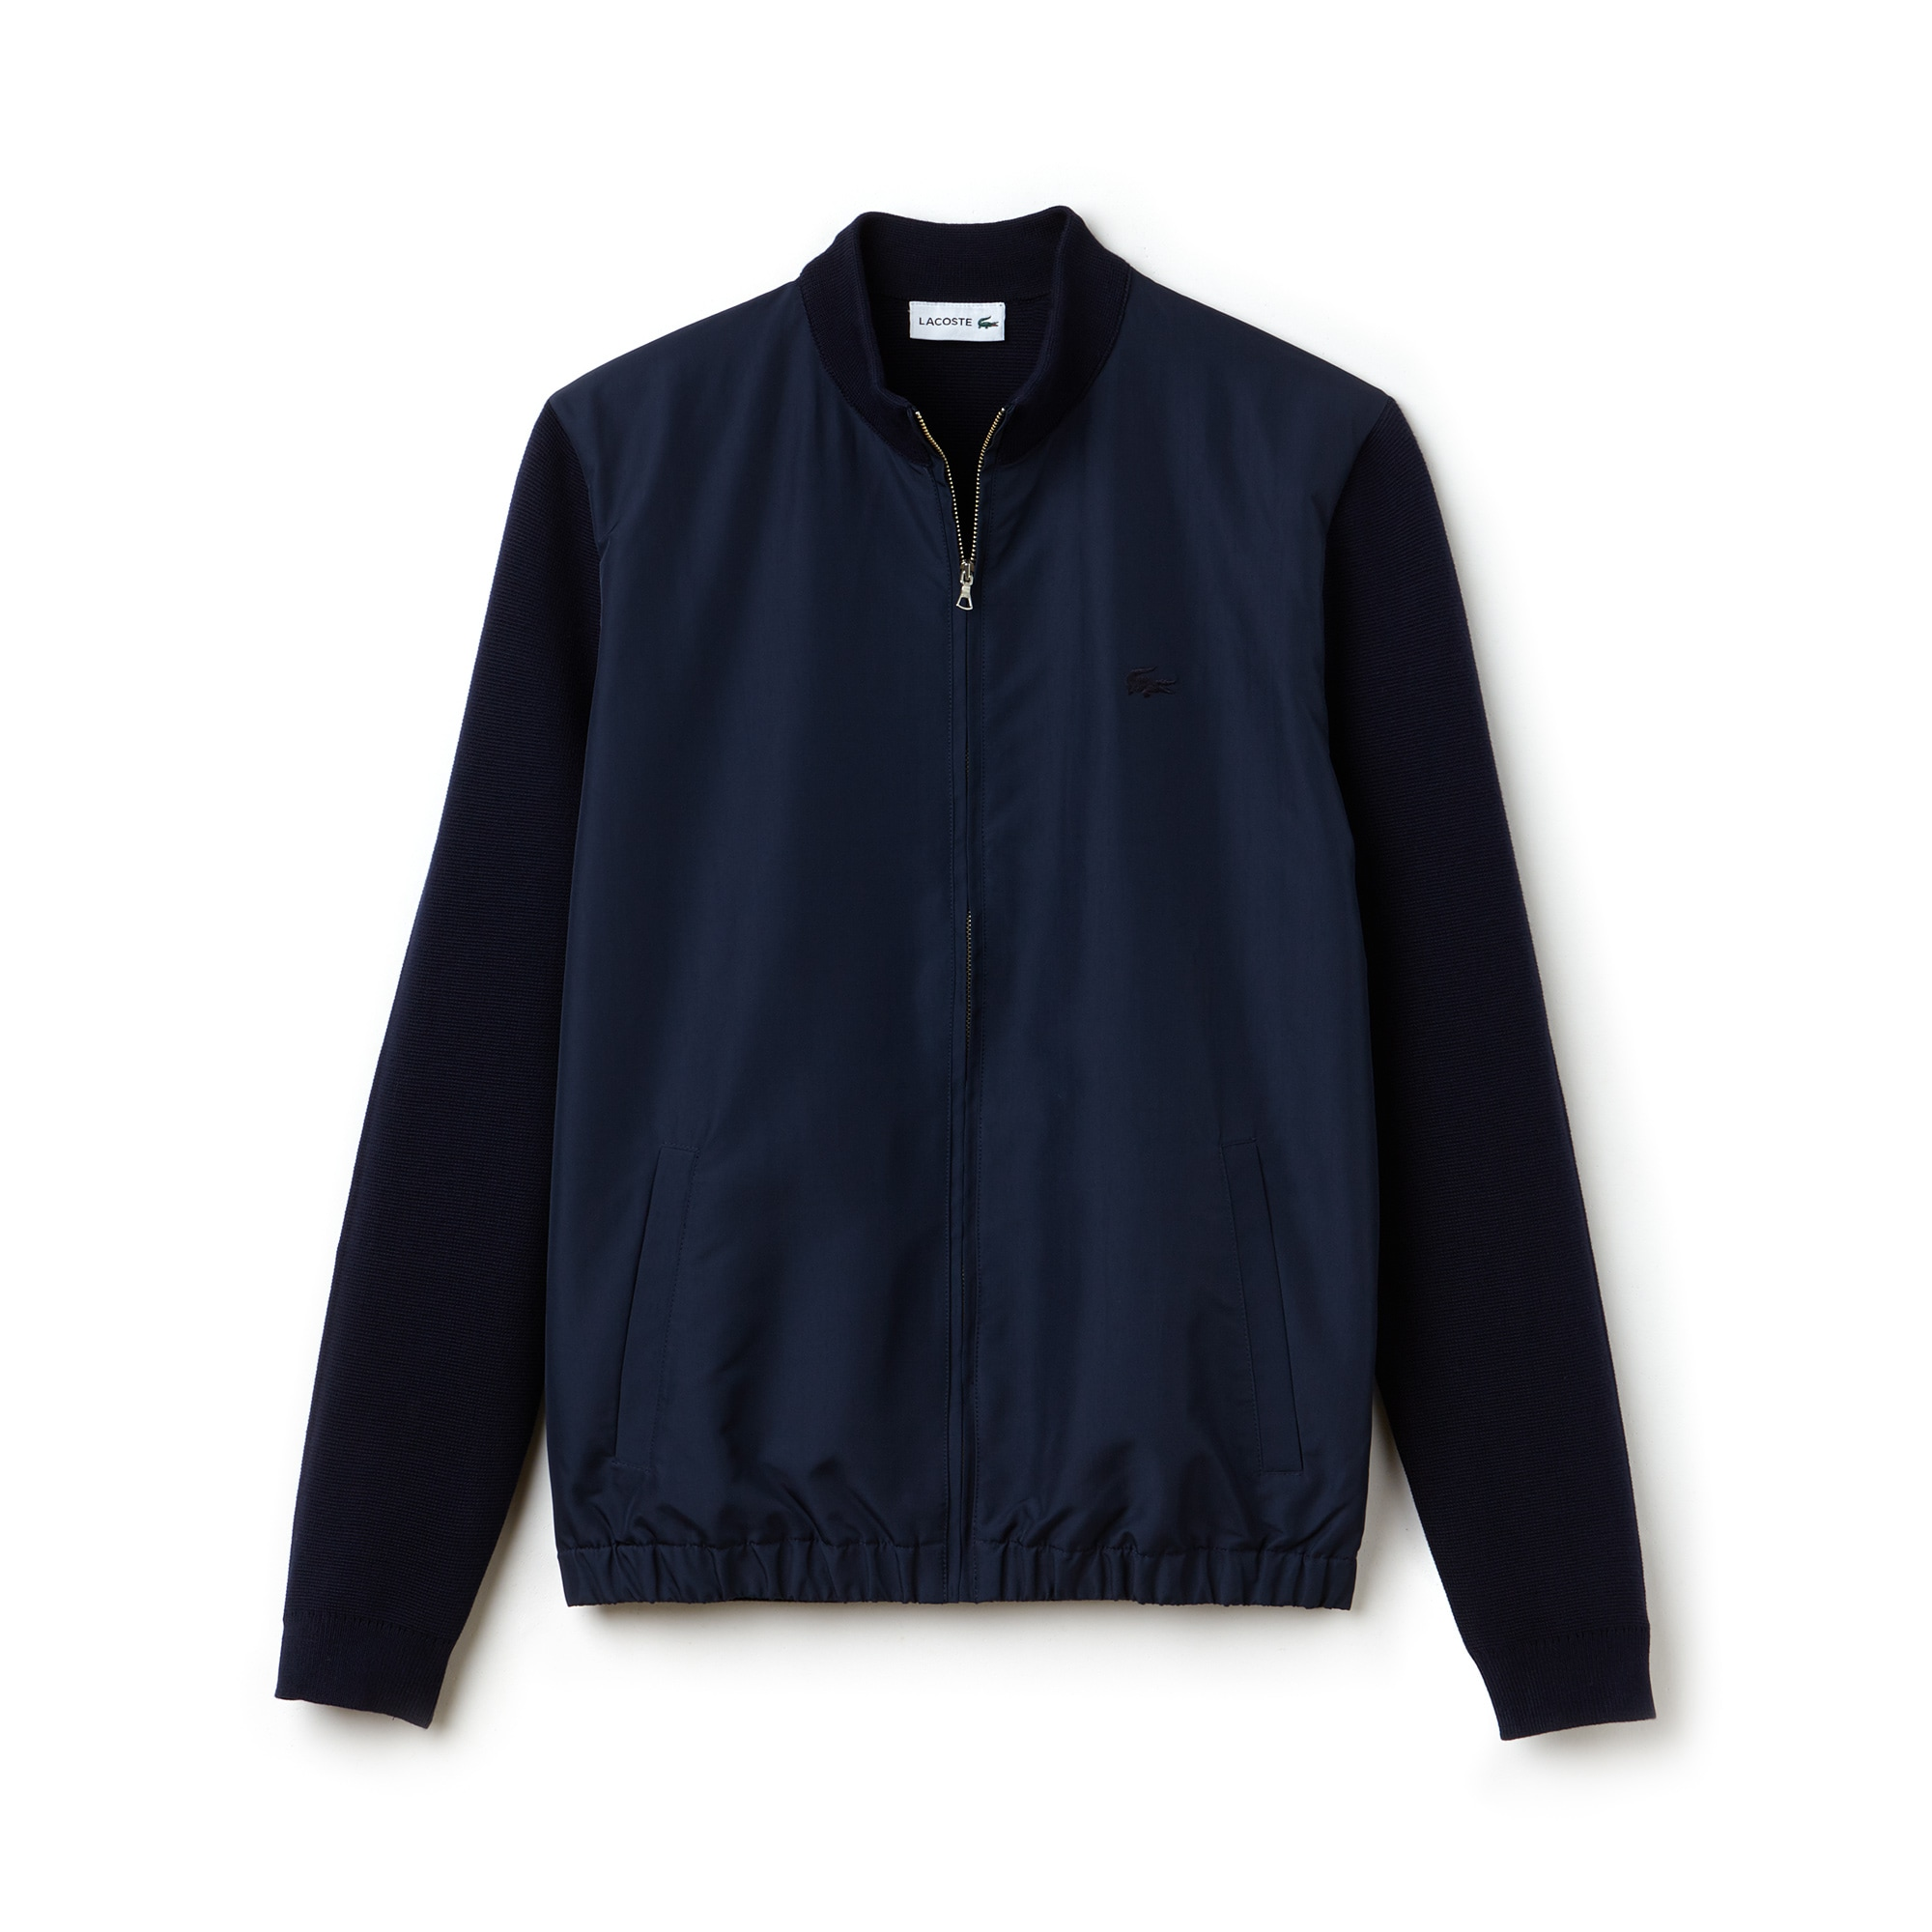 Men's Zippered Bicolor Milano Cotton And Nylon Cardigan